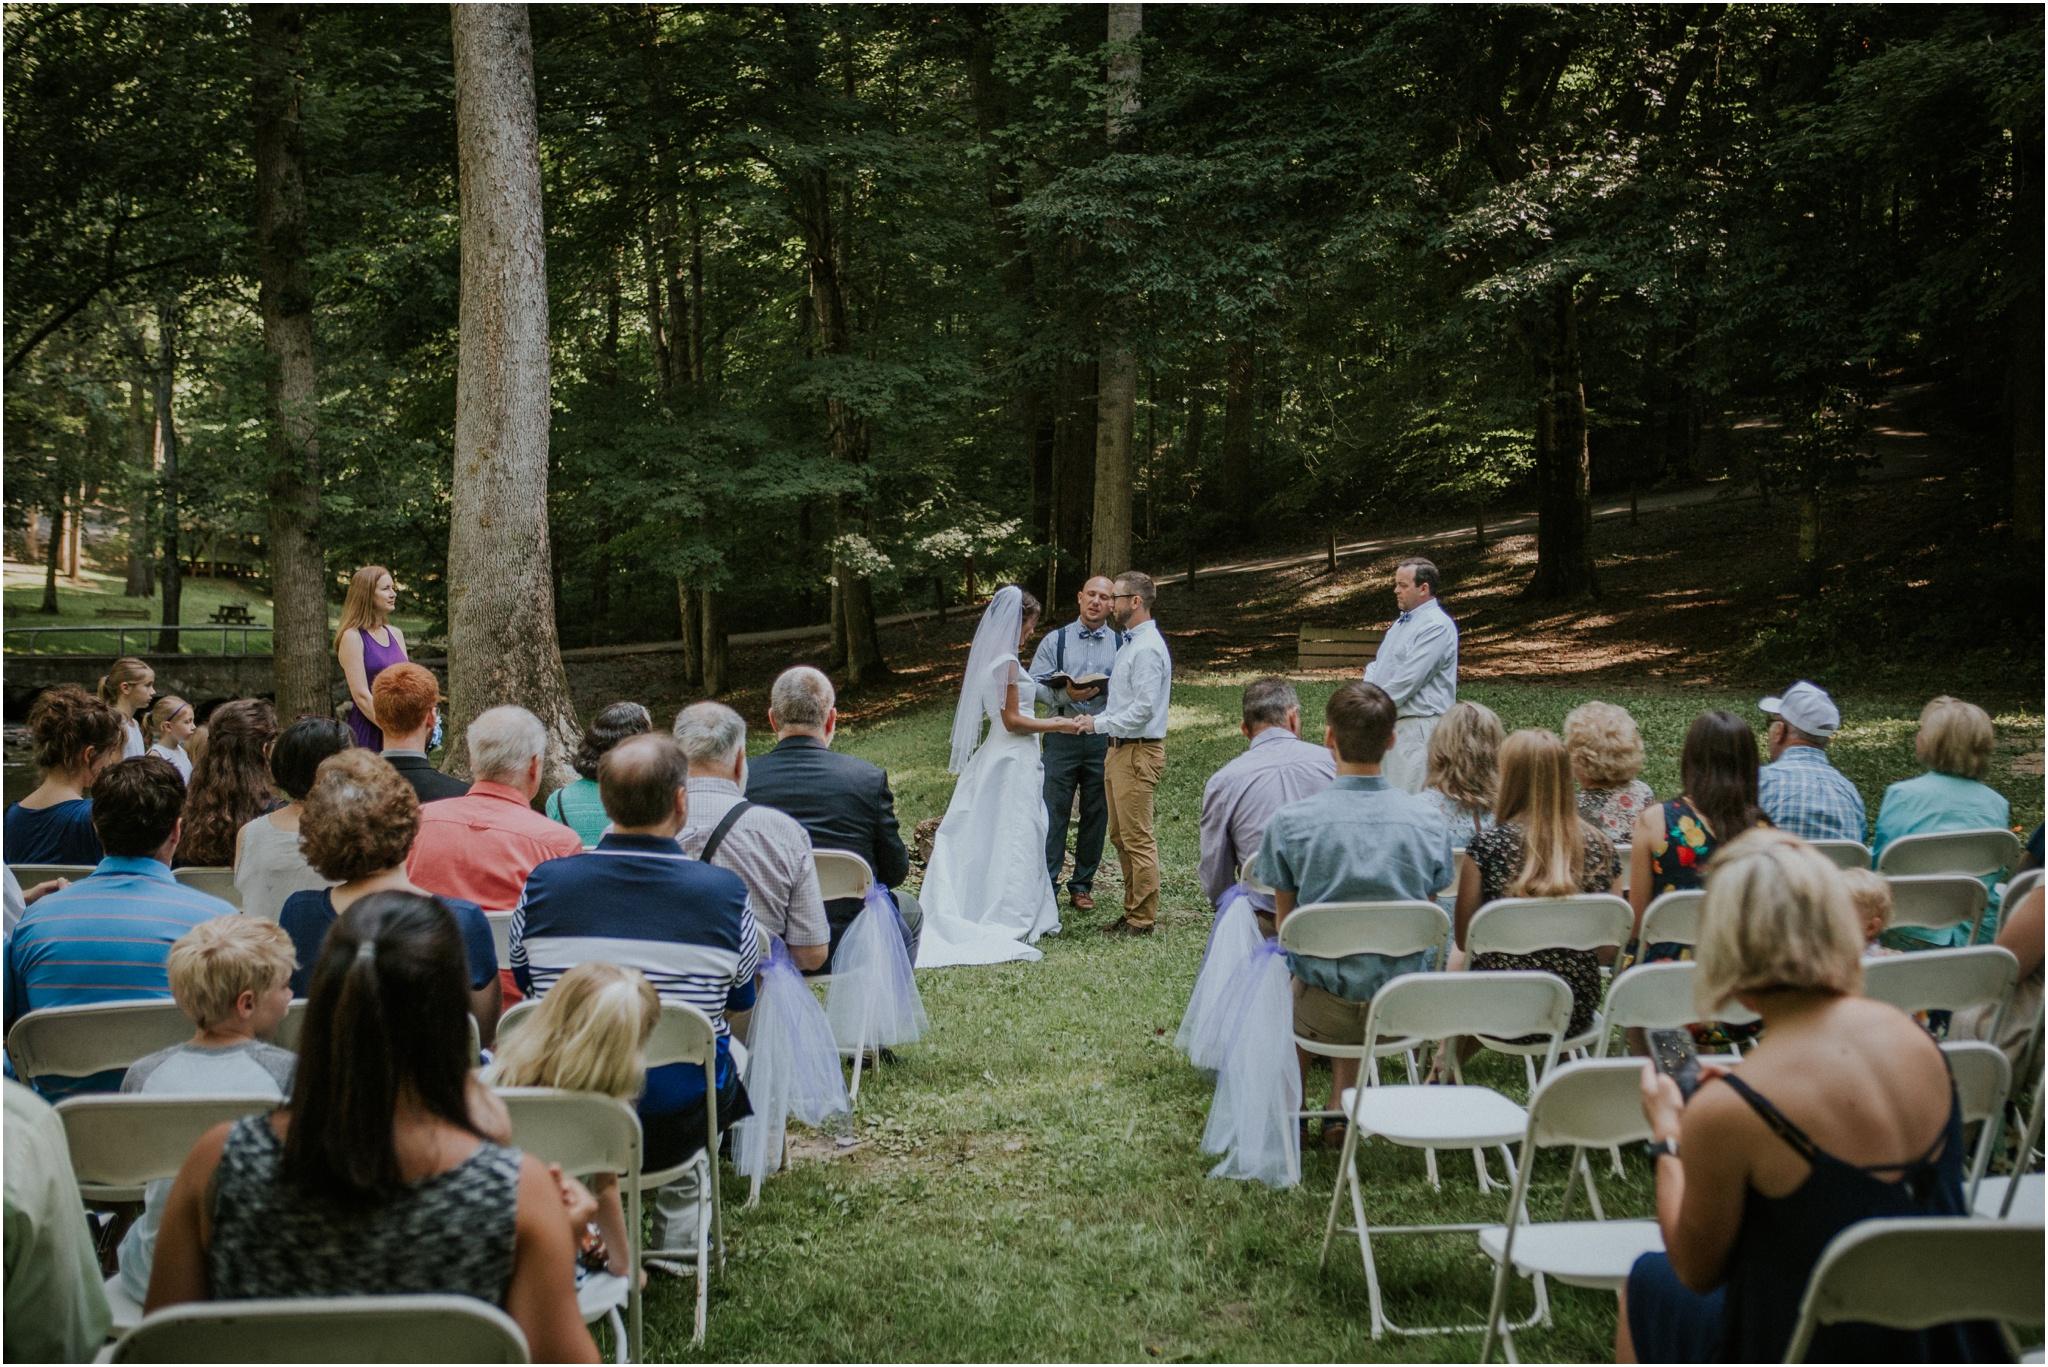 sugar-hollow-park-bristol-virginia-wedding-intimate-woodsy-black-forest-ceremony-adventurous-couple_0018.jpg